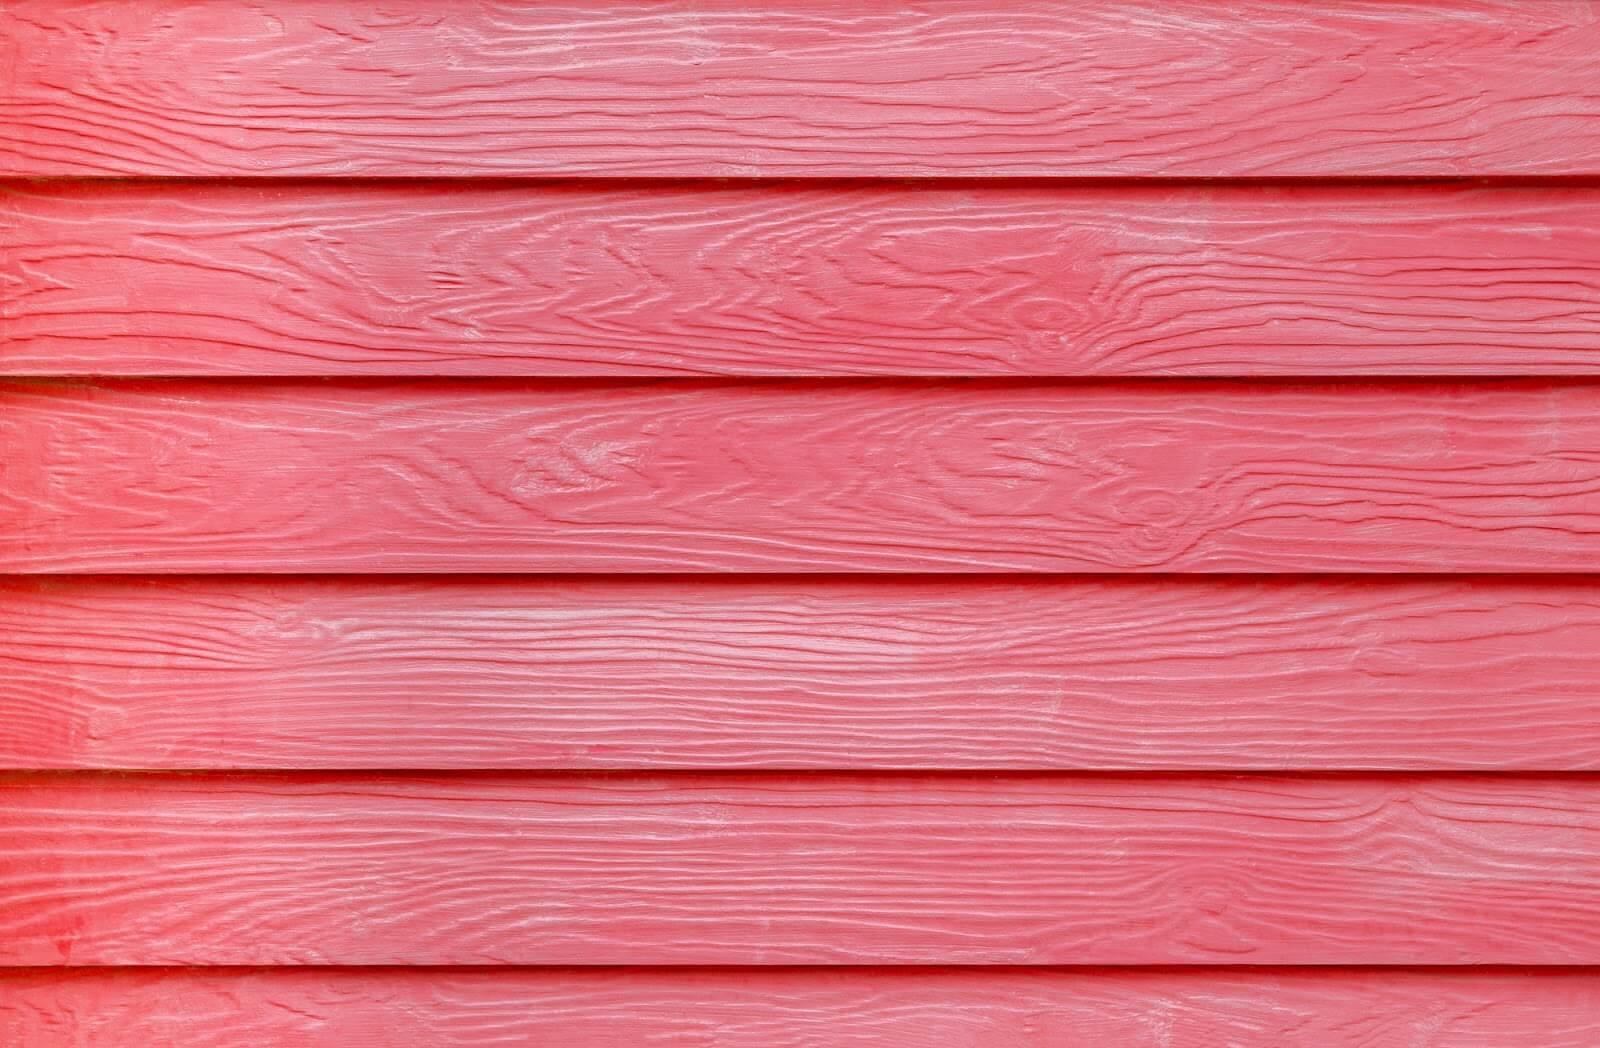 red siding